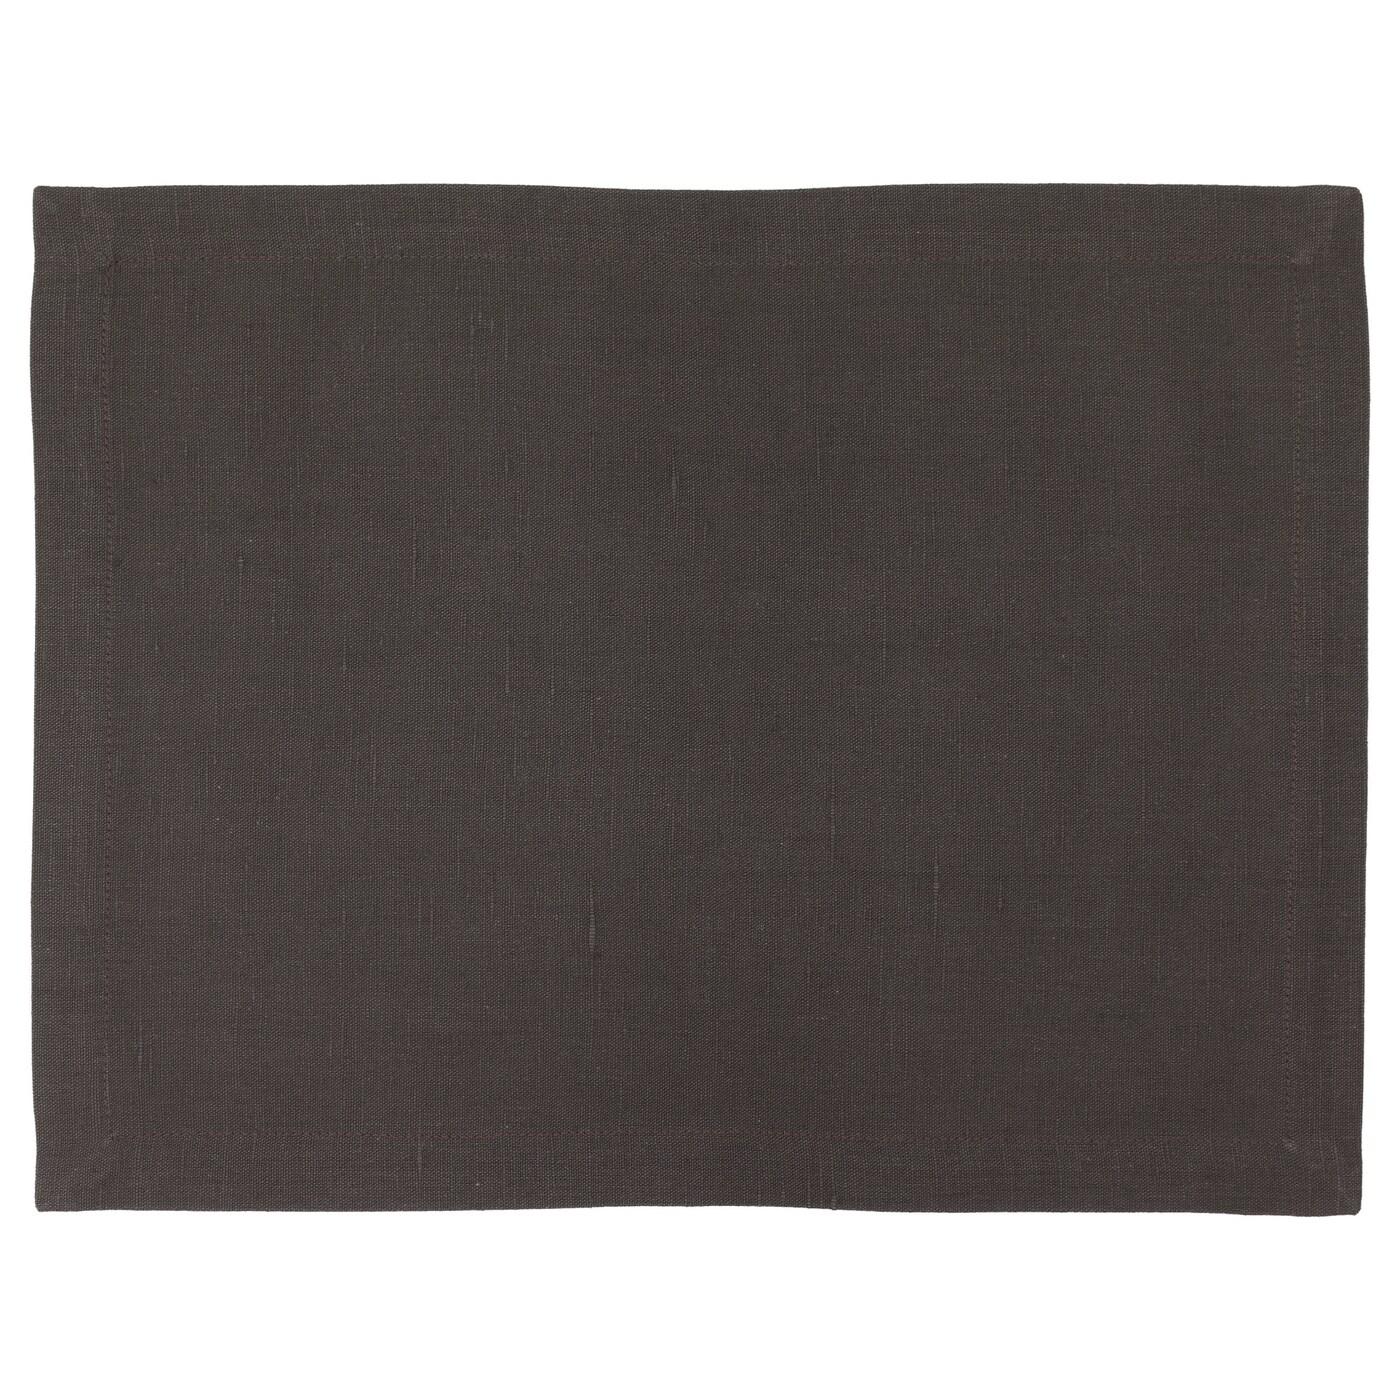 marknad set de table noir 45x35 cm ikea. Black Bedroom Furniture Sets. Home Design Ideas